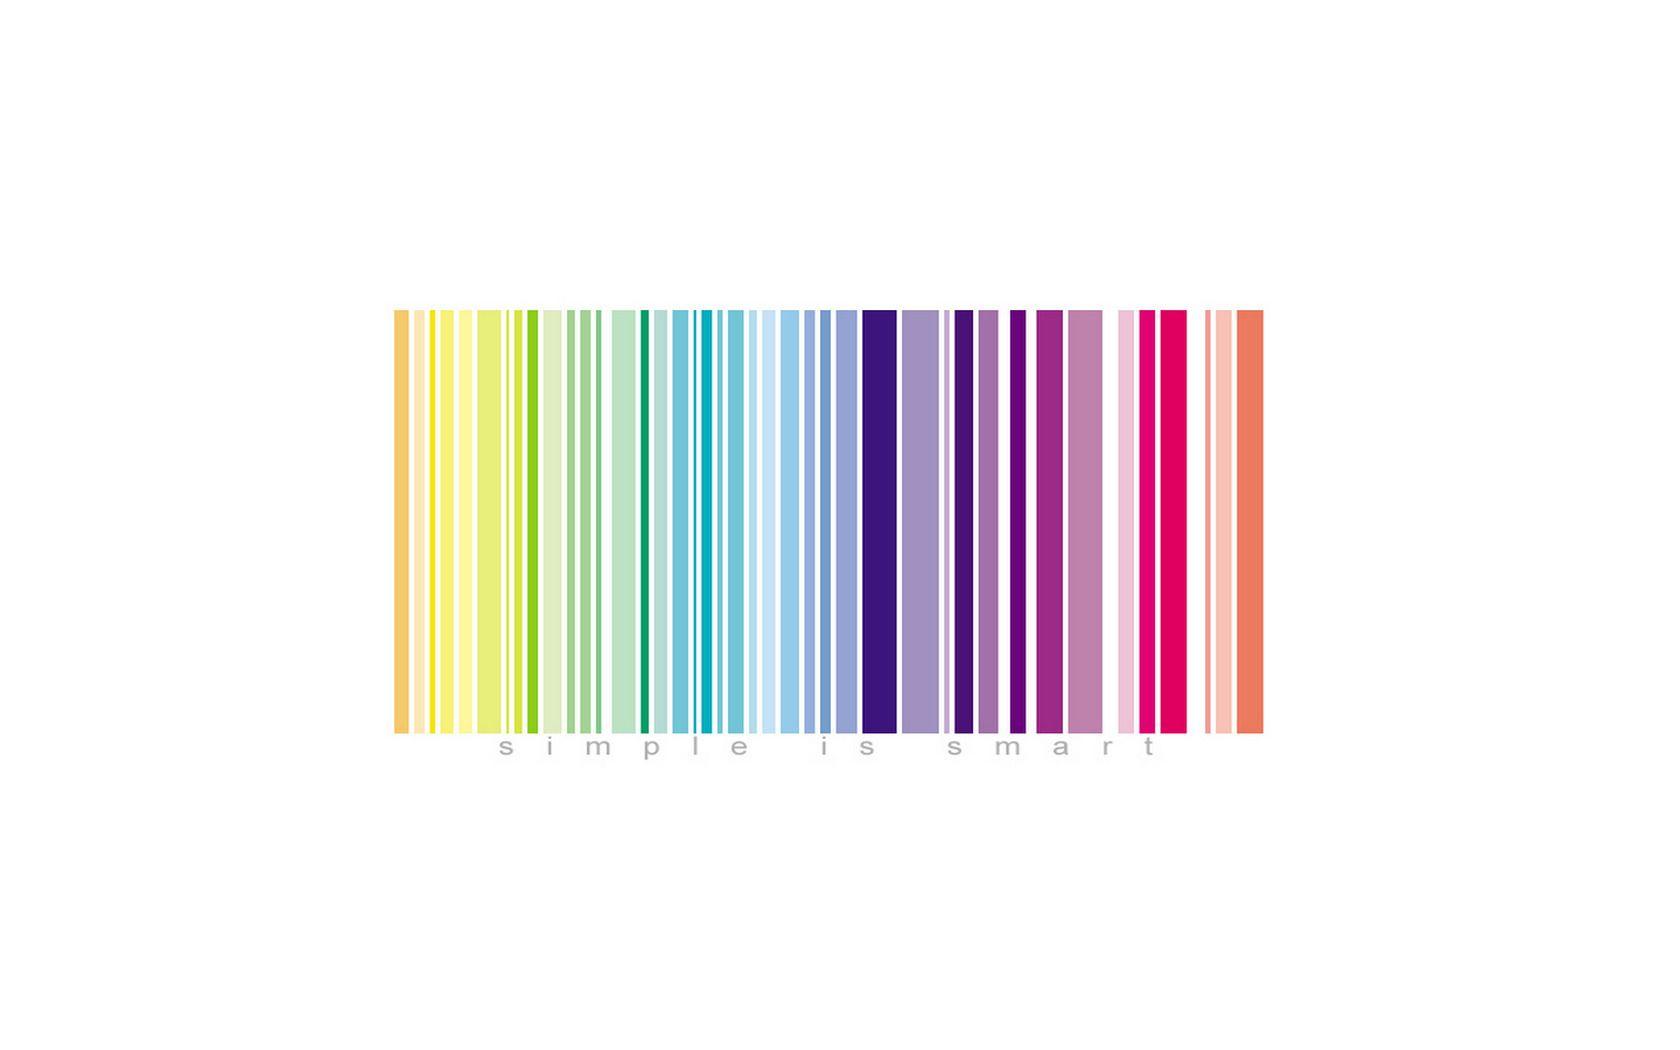 Colorful barcode barcode design barcode generator